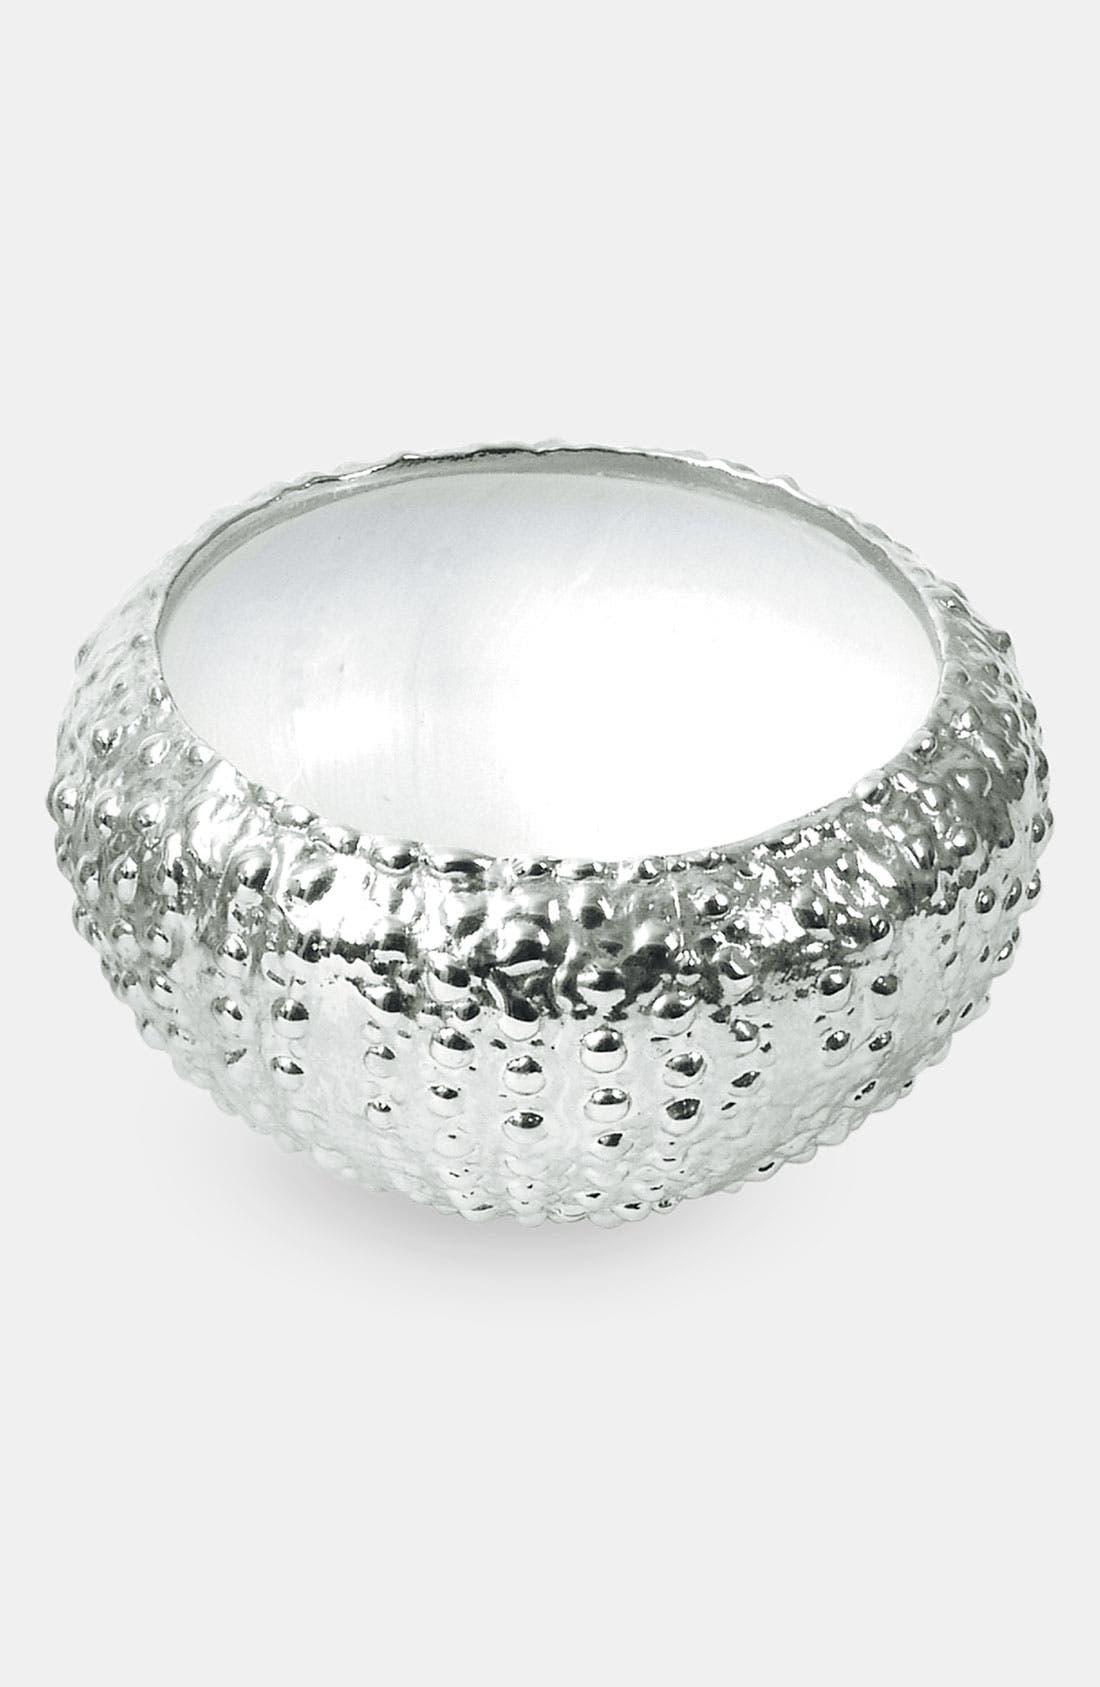 Alternate Image 1 Selected - Michael Aram 'Ocean Sea Urchin' Bowl